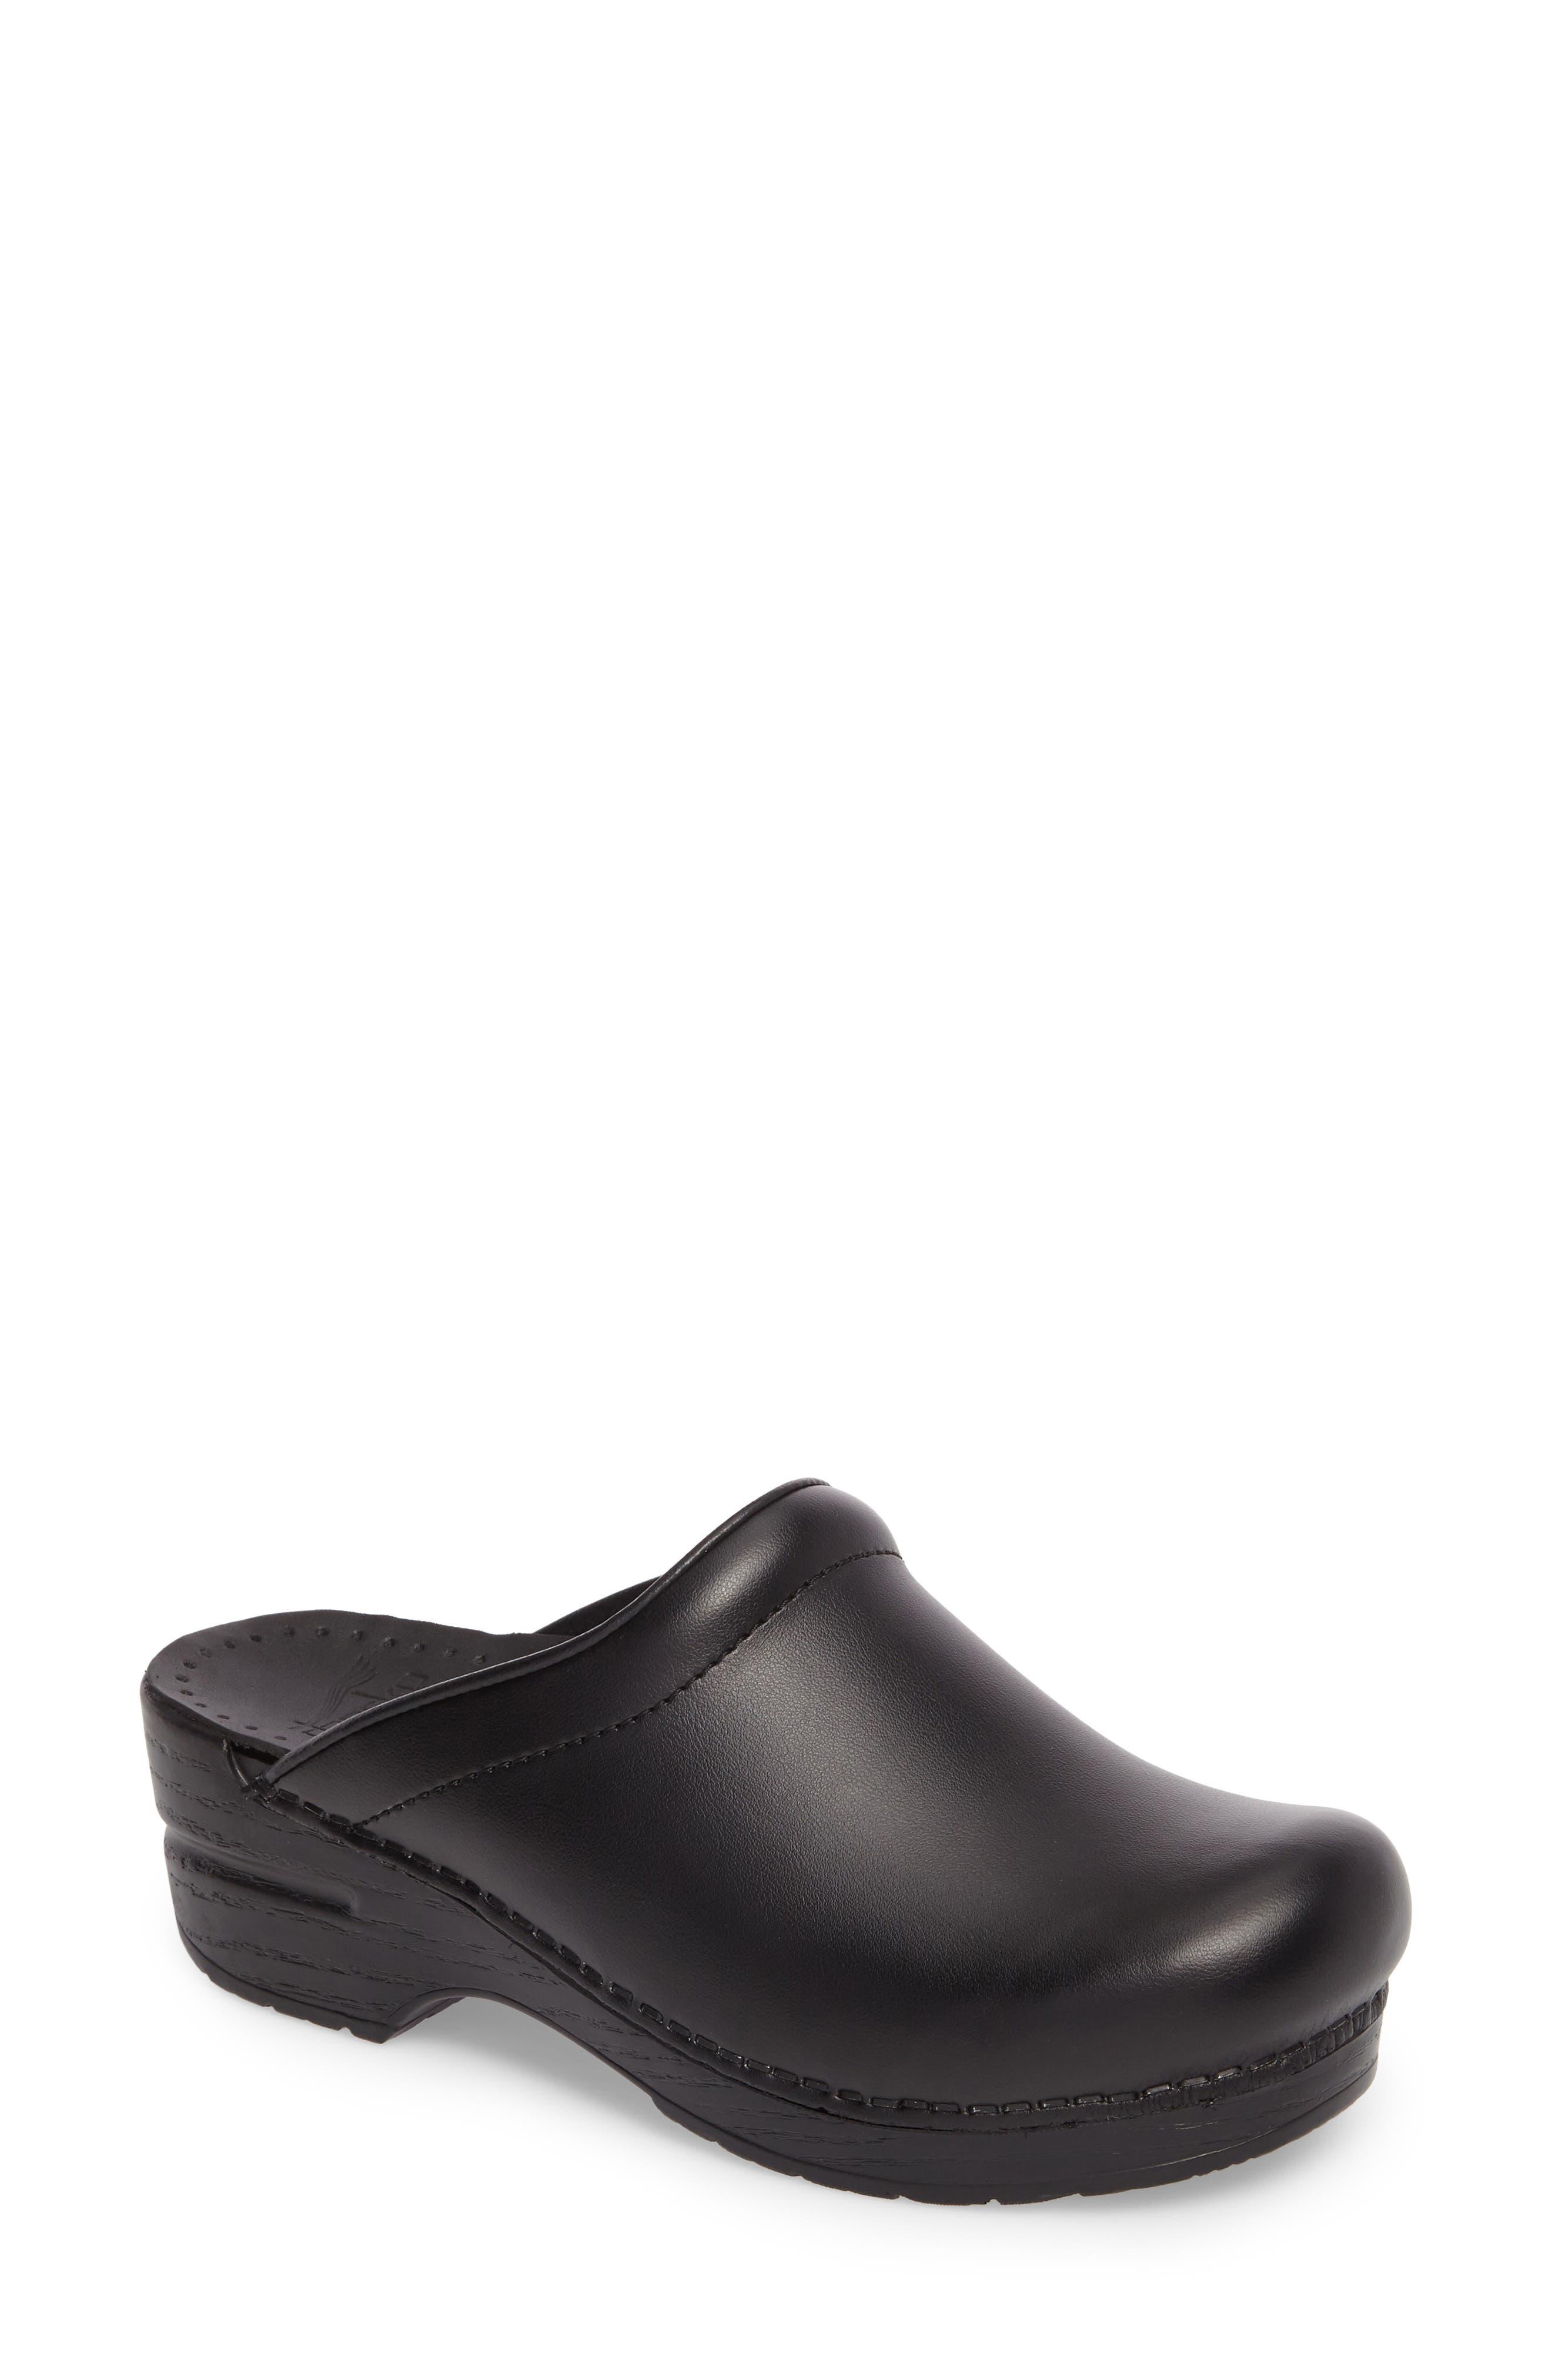 'Sonja' Patent Leather Clog,                             Main thumbnail 1, color,                             BLACK BOX LEATHER